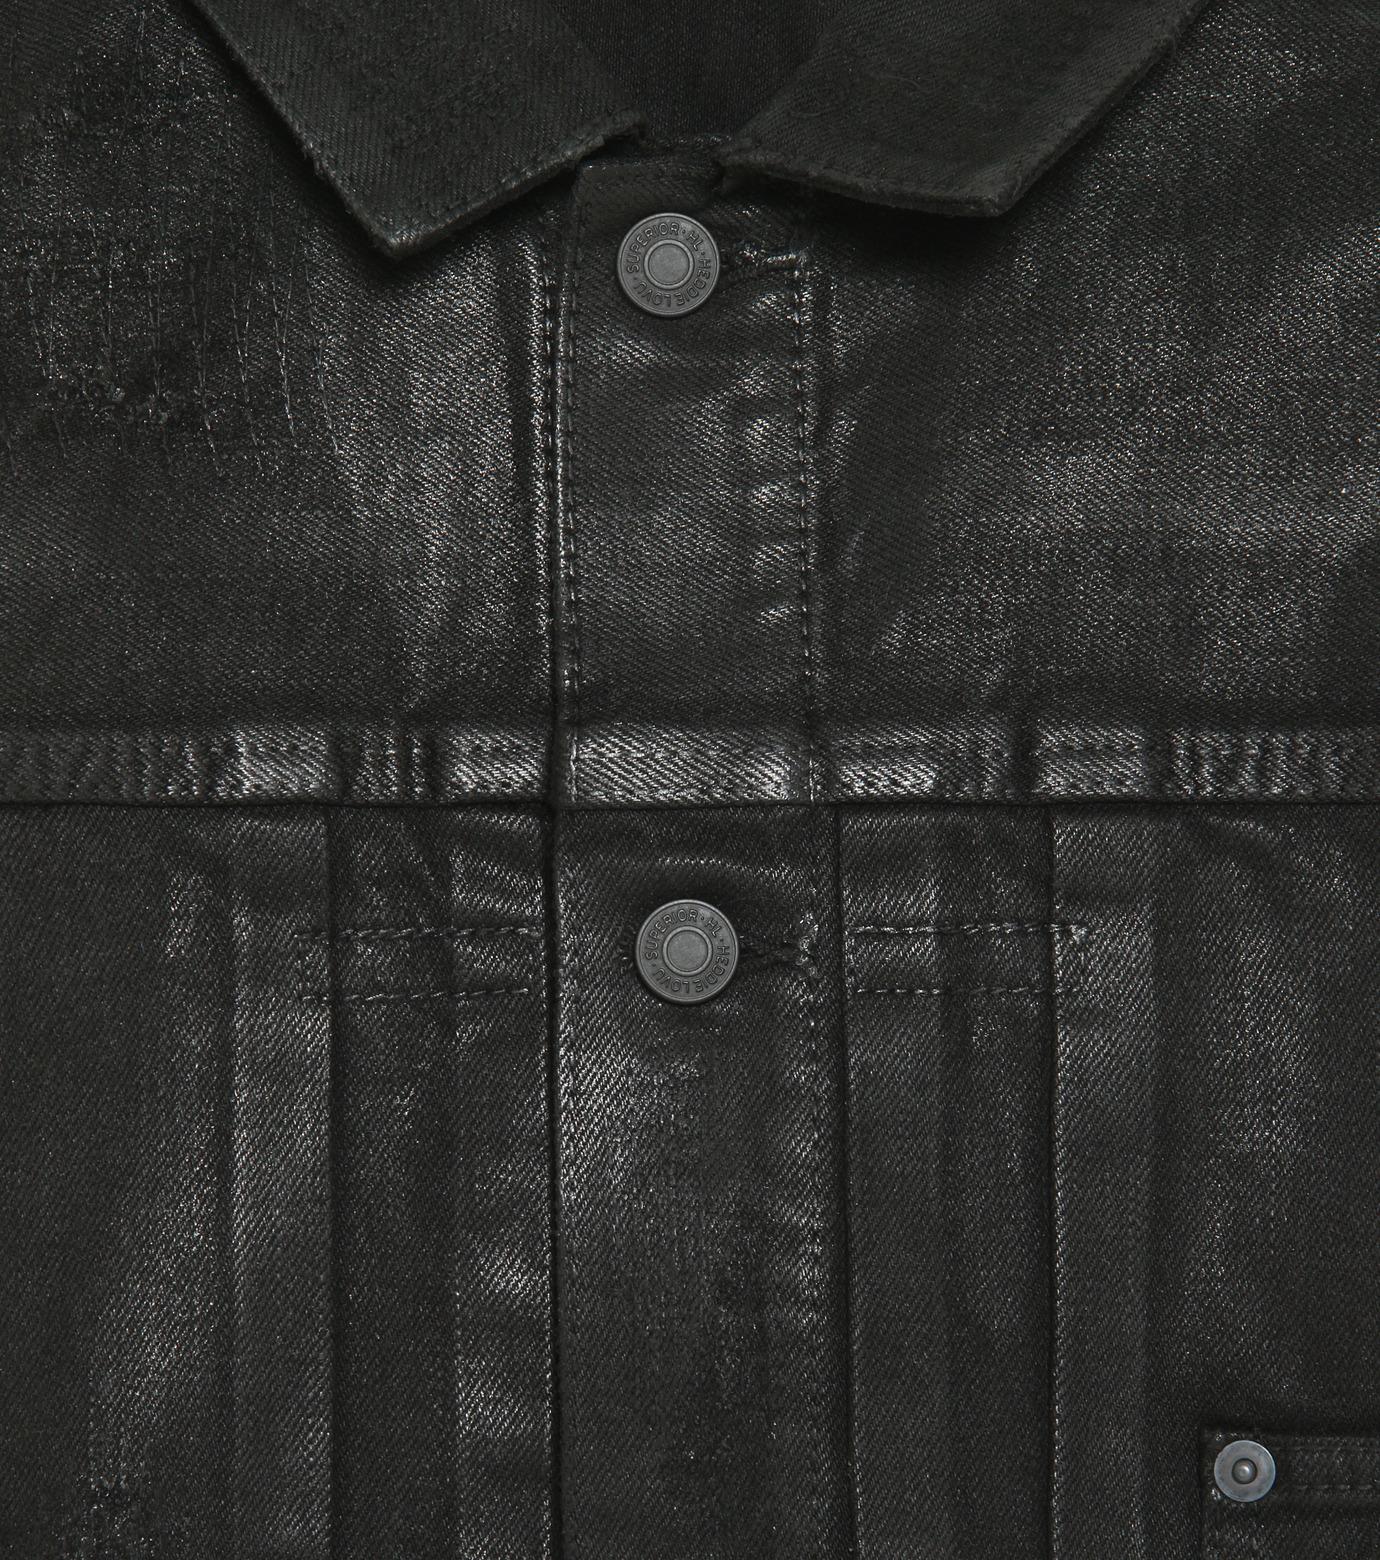 HL HEDDIE LOVU(エイチエル・エディールーヴ)のCOATING BLACK DENIM JACKET-BLACK(ジャケット/jacket)-17A94001-13 拡大詳細画像3